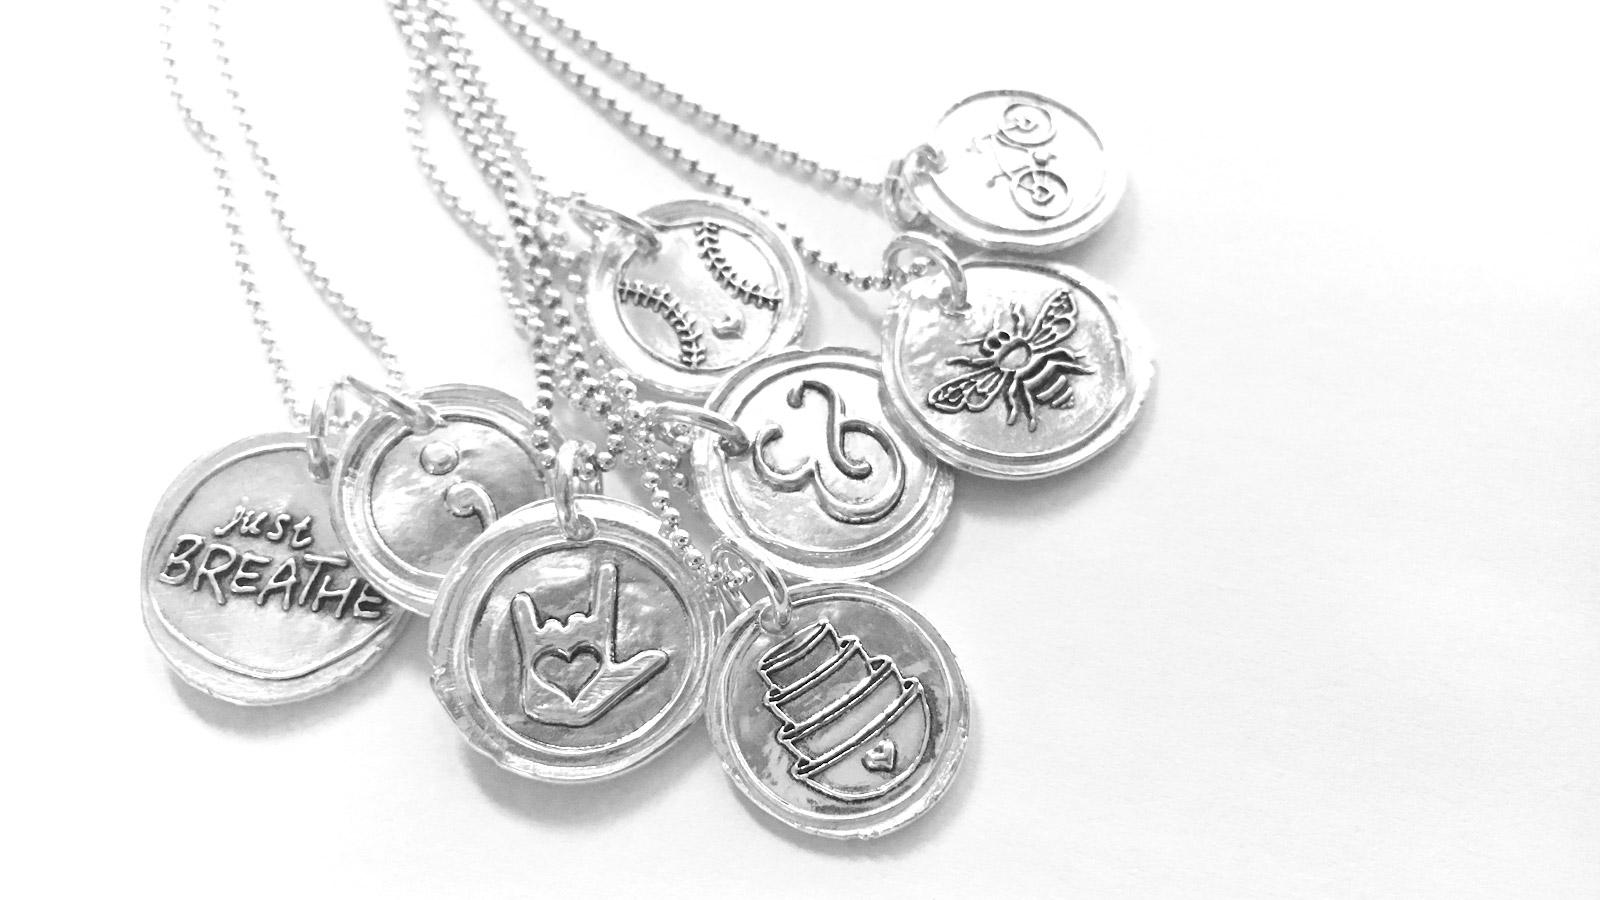 Wax Seal Jewelry